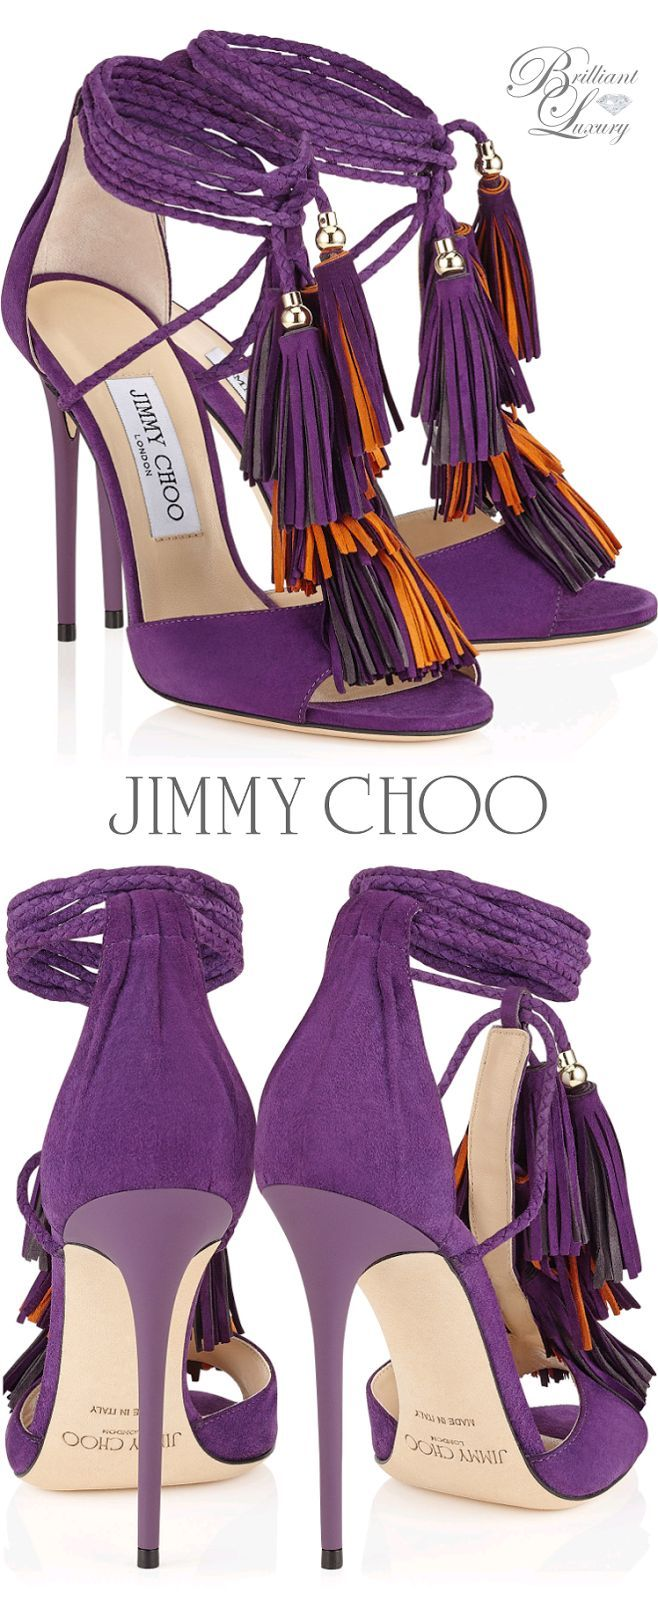 Brilliant #Luxury * Jimmy Choo 'Mindy' FW 2015 www.pinterest.com...